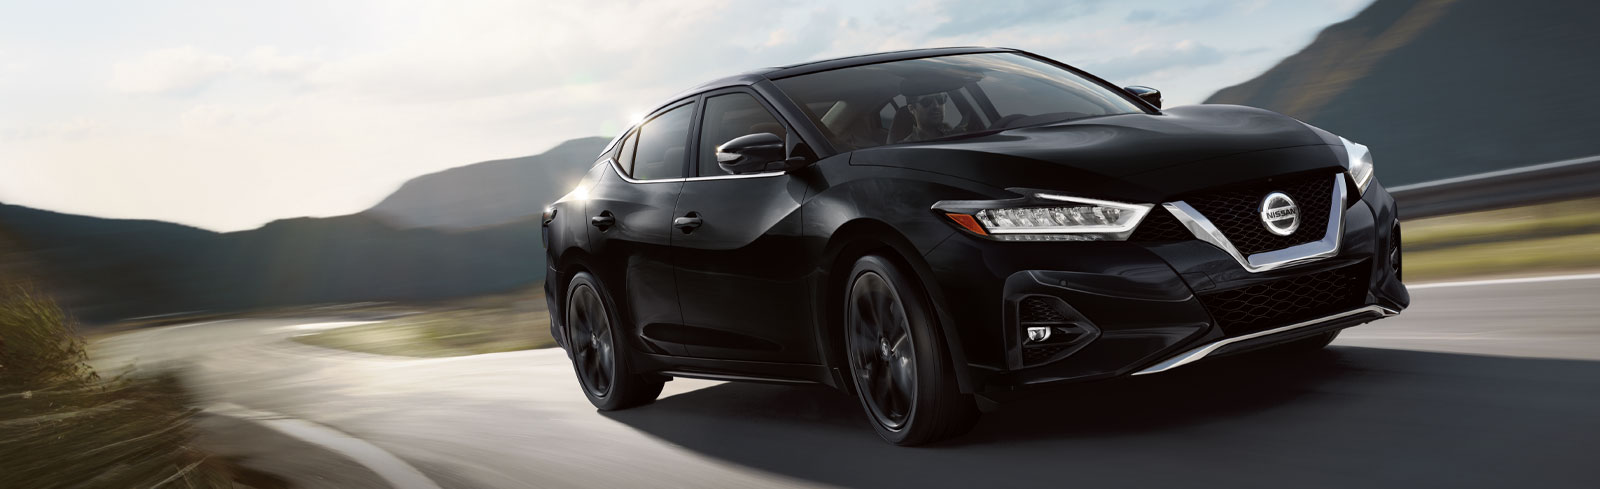 2020 Nissan Maxima For Sale Near Salem NH